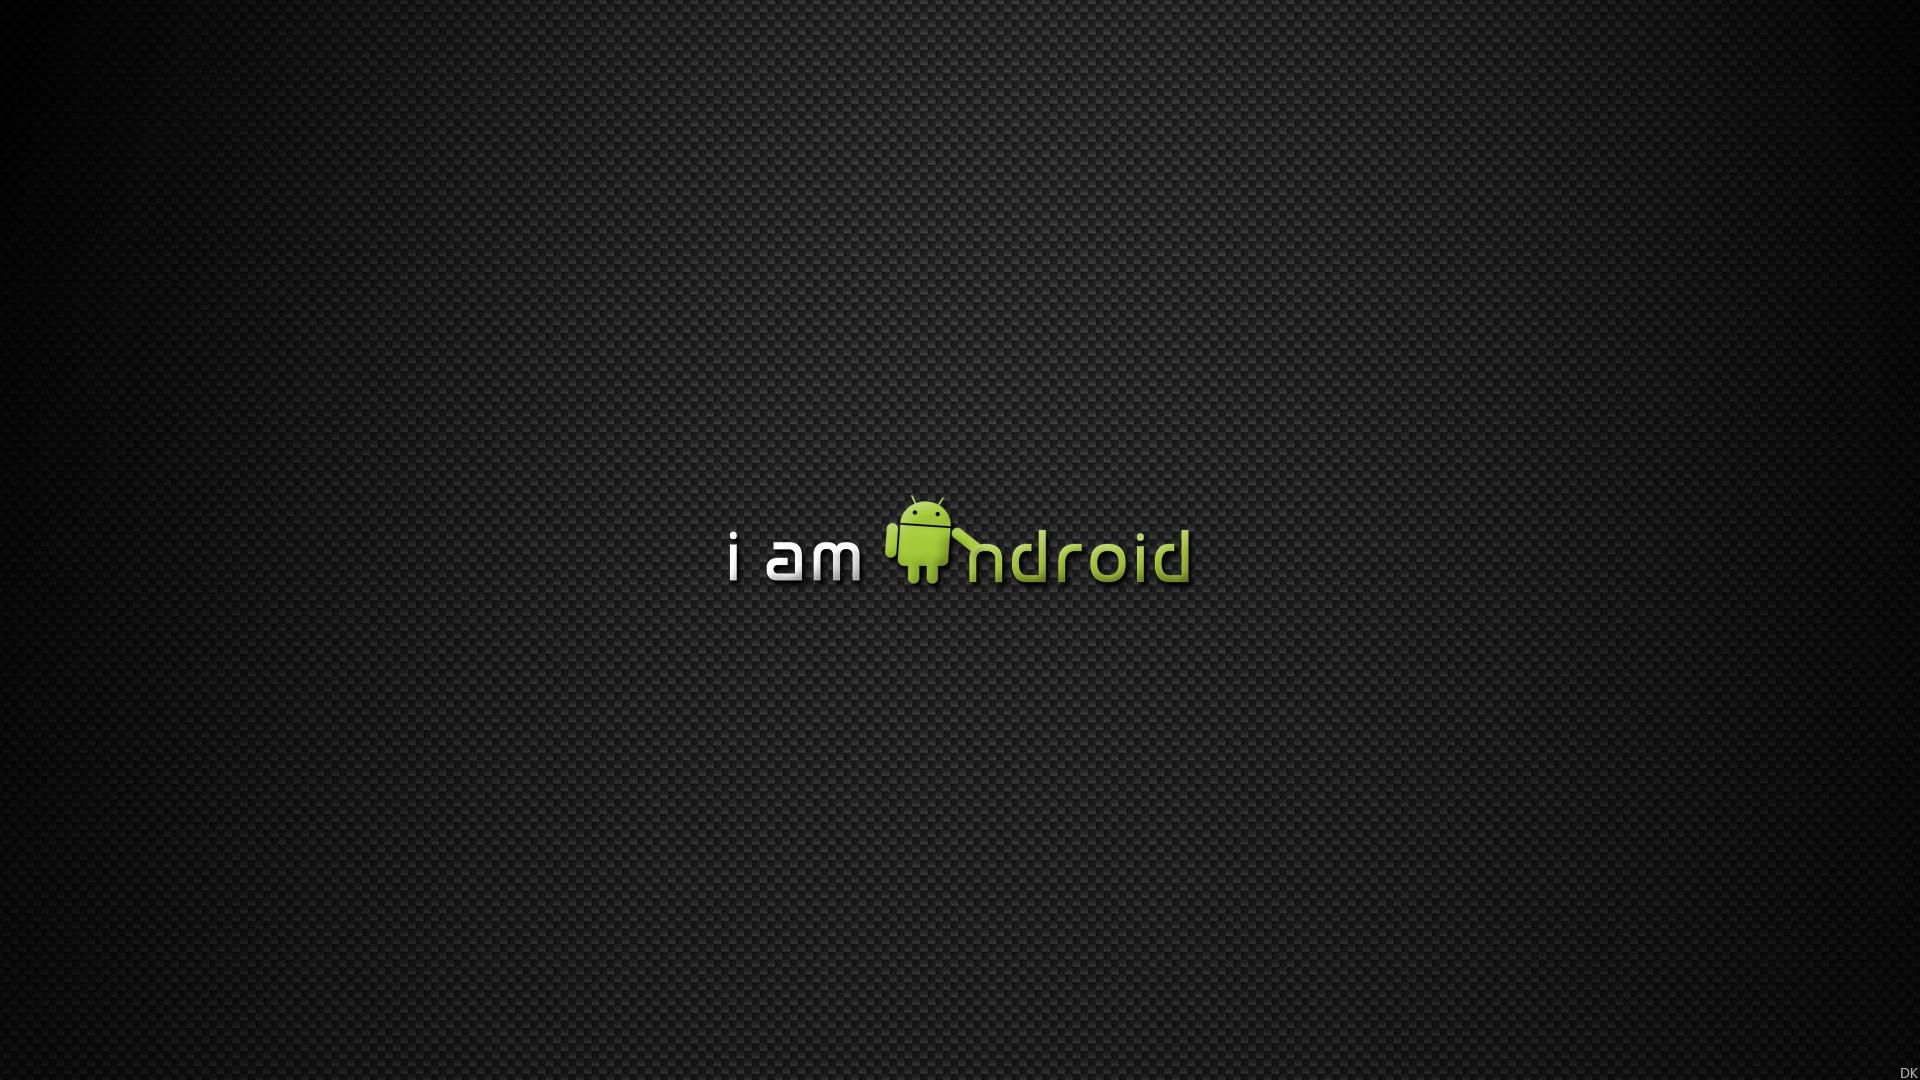 android logo black background 5392 wallpaper cool walldiskpaper com